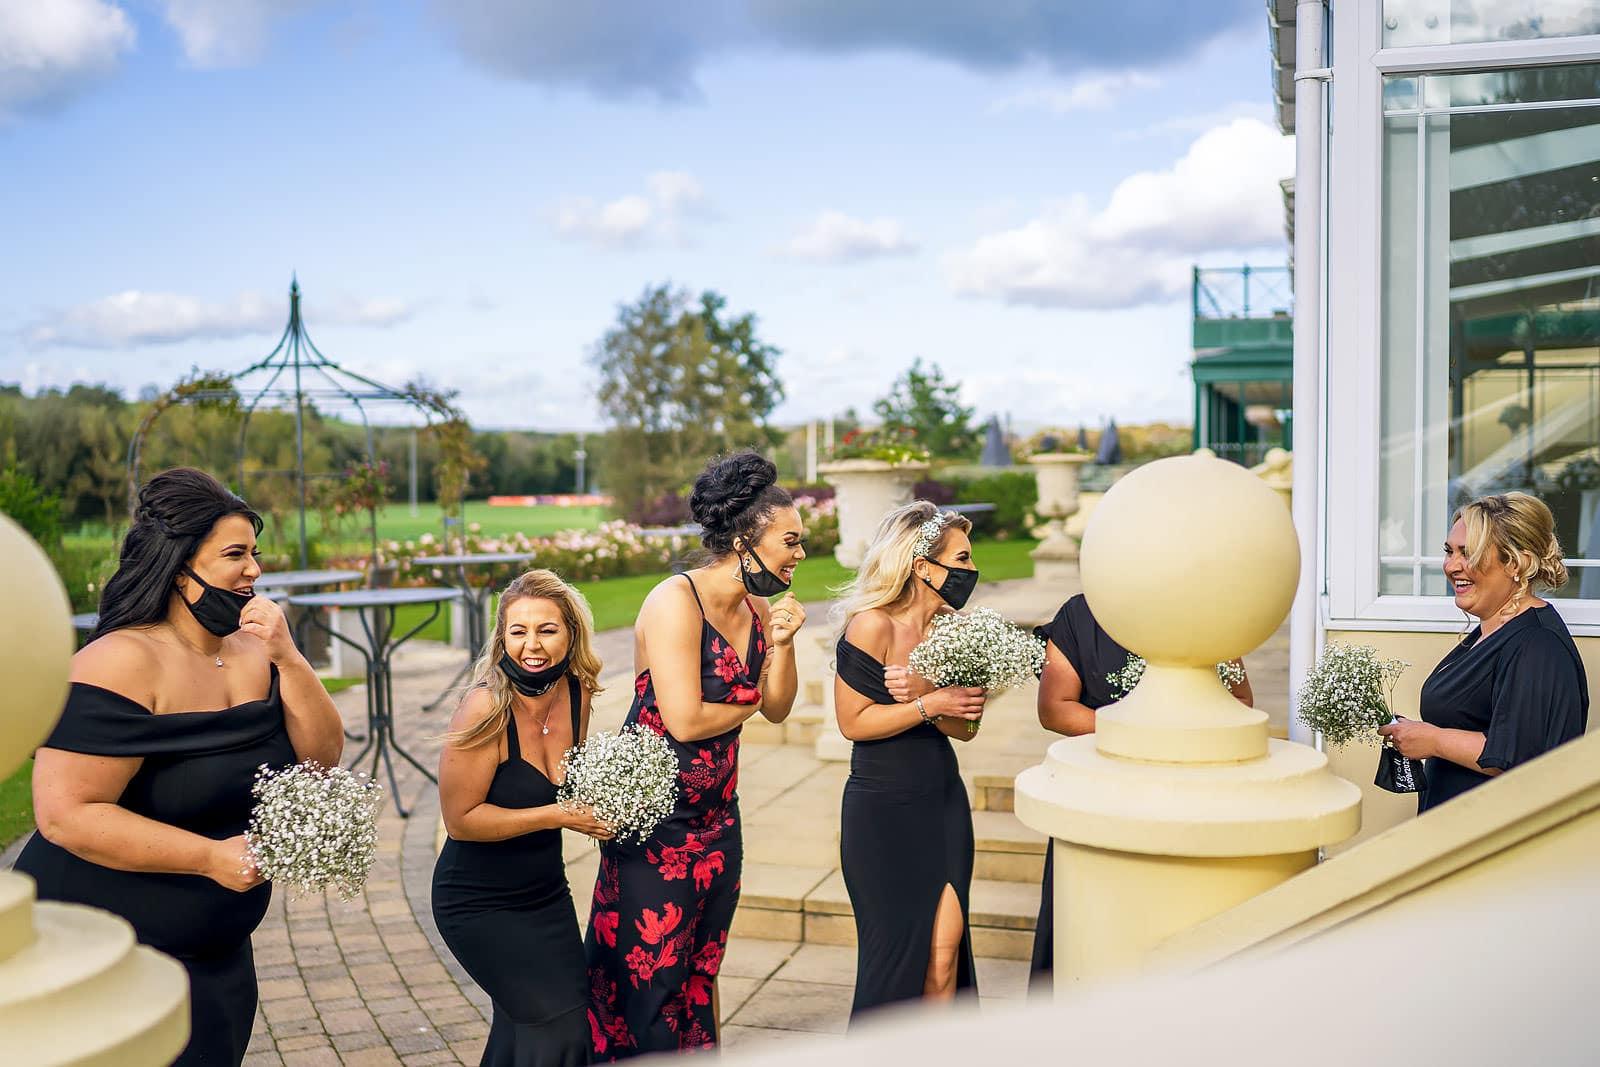 Hensol Castle wedding photographer